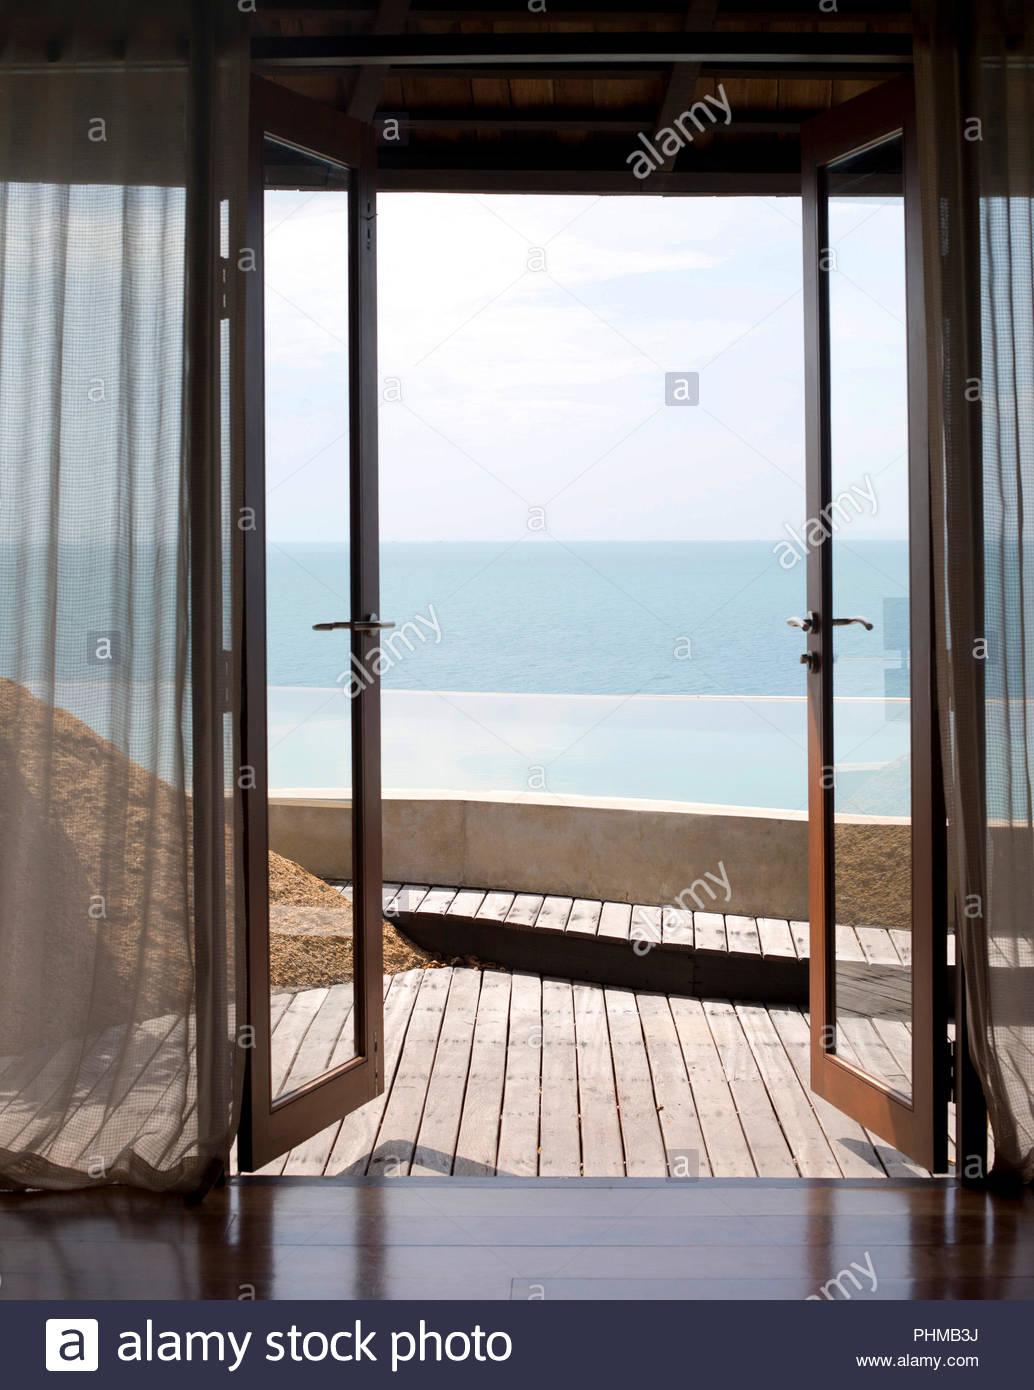 Open glass doors to swimming pool - Stock Image